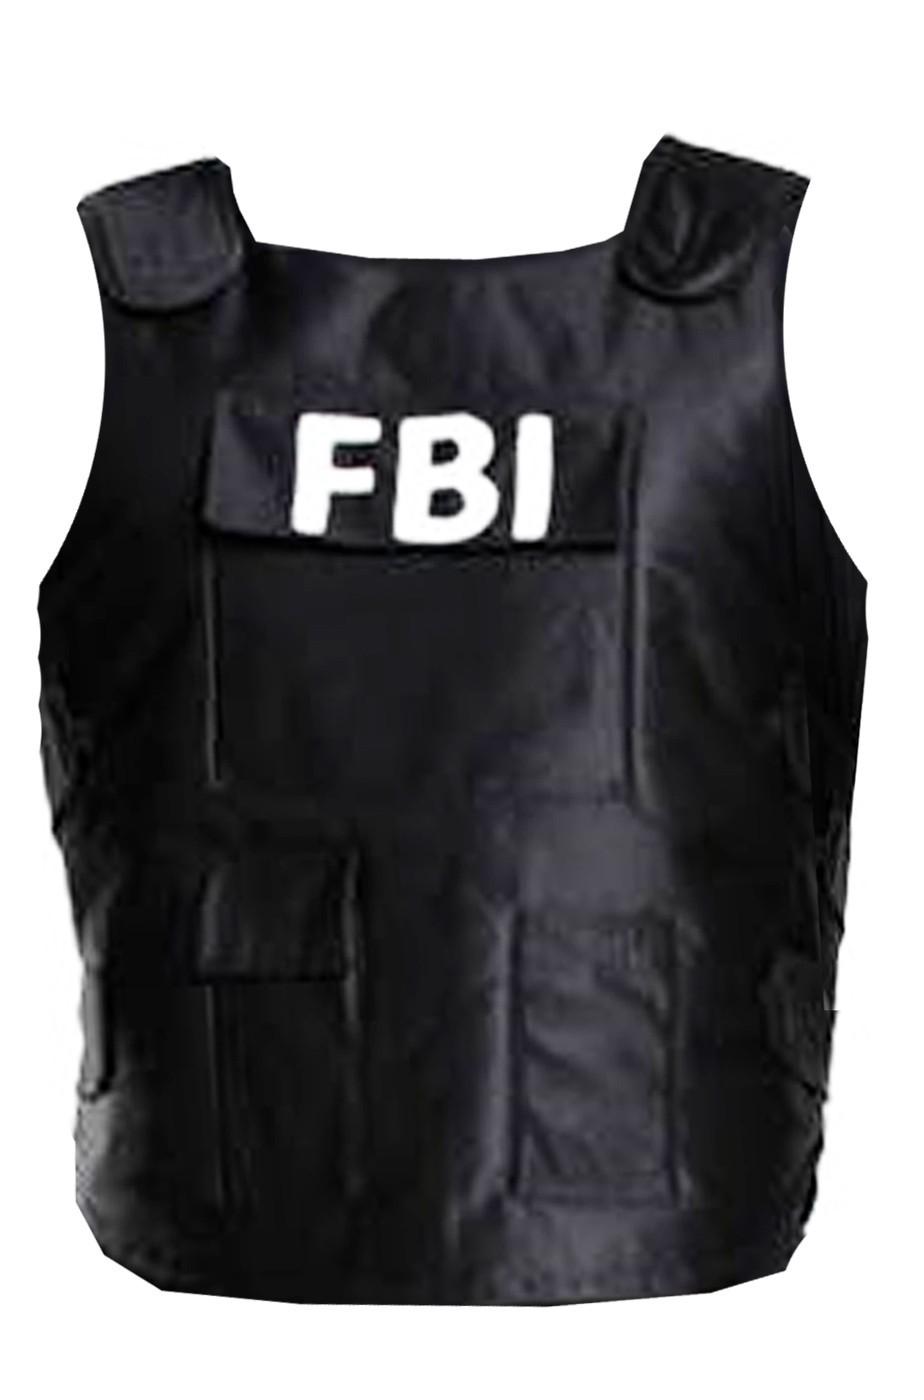 Giubbotto antiproiettile FBI